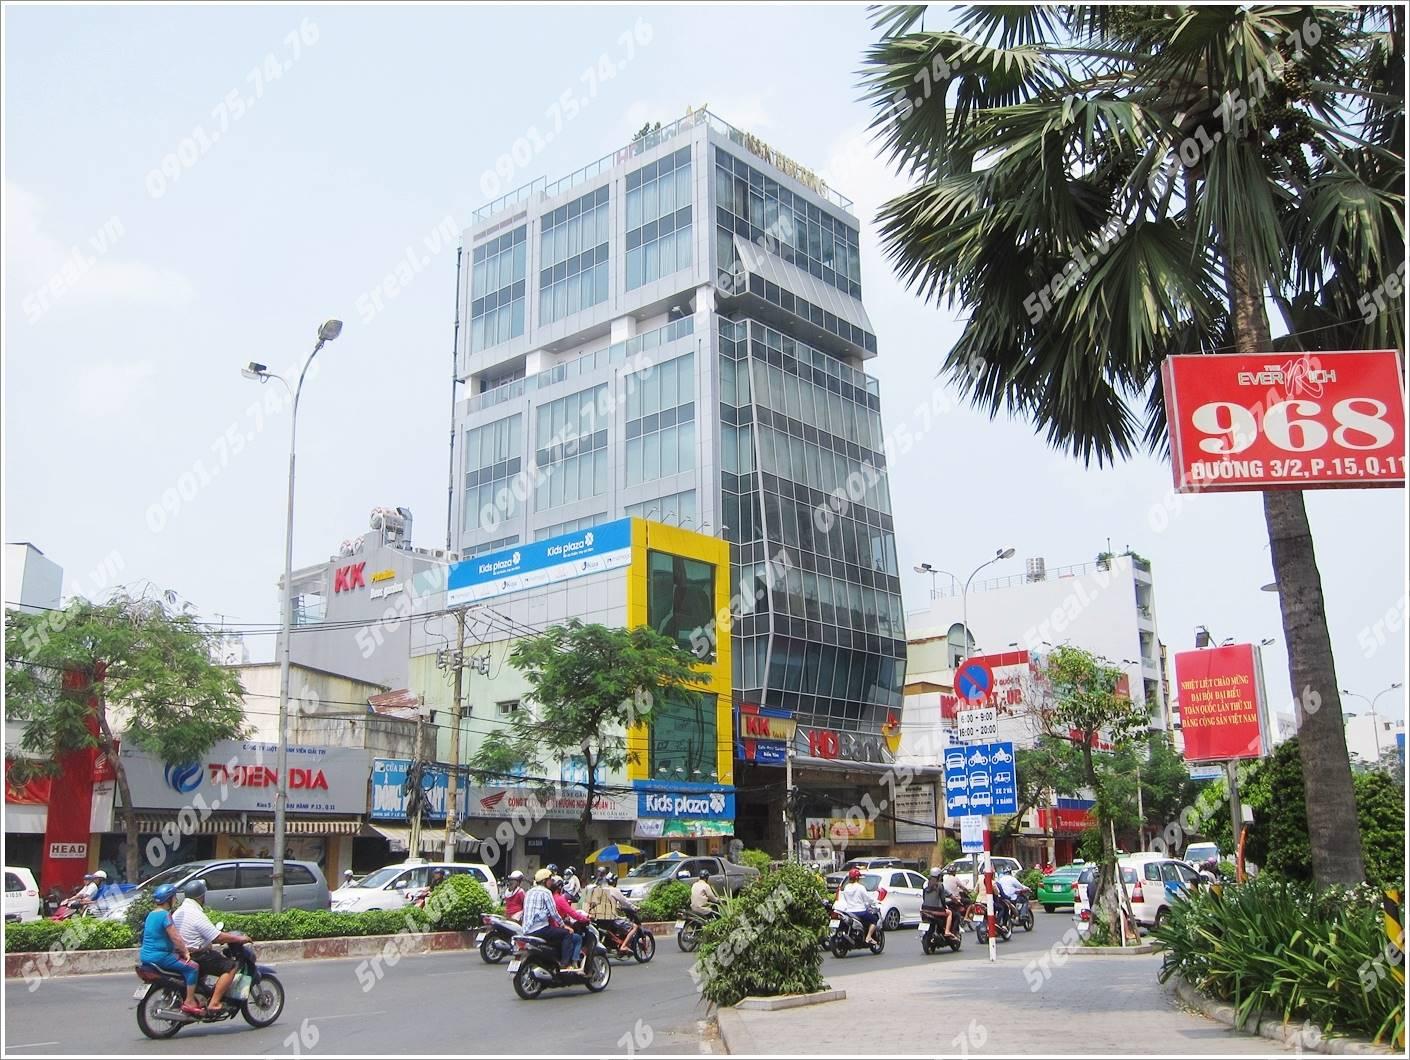 kk-building-le-dai-hanh-quan-11-van-phong-cho-thue-tphcm-5real.vn-01